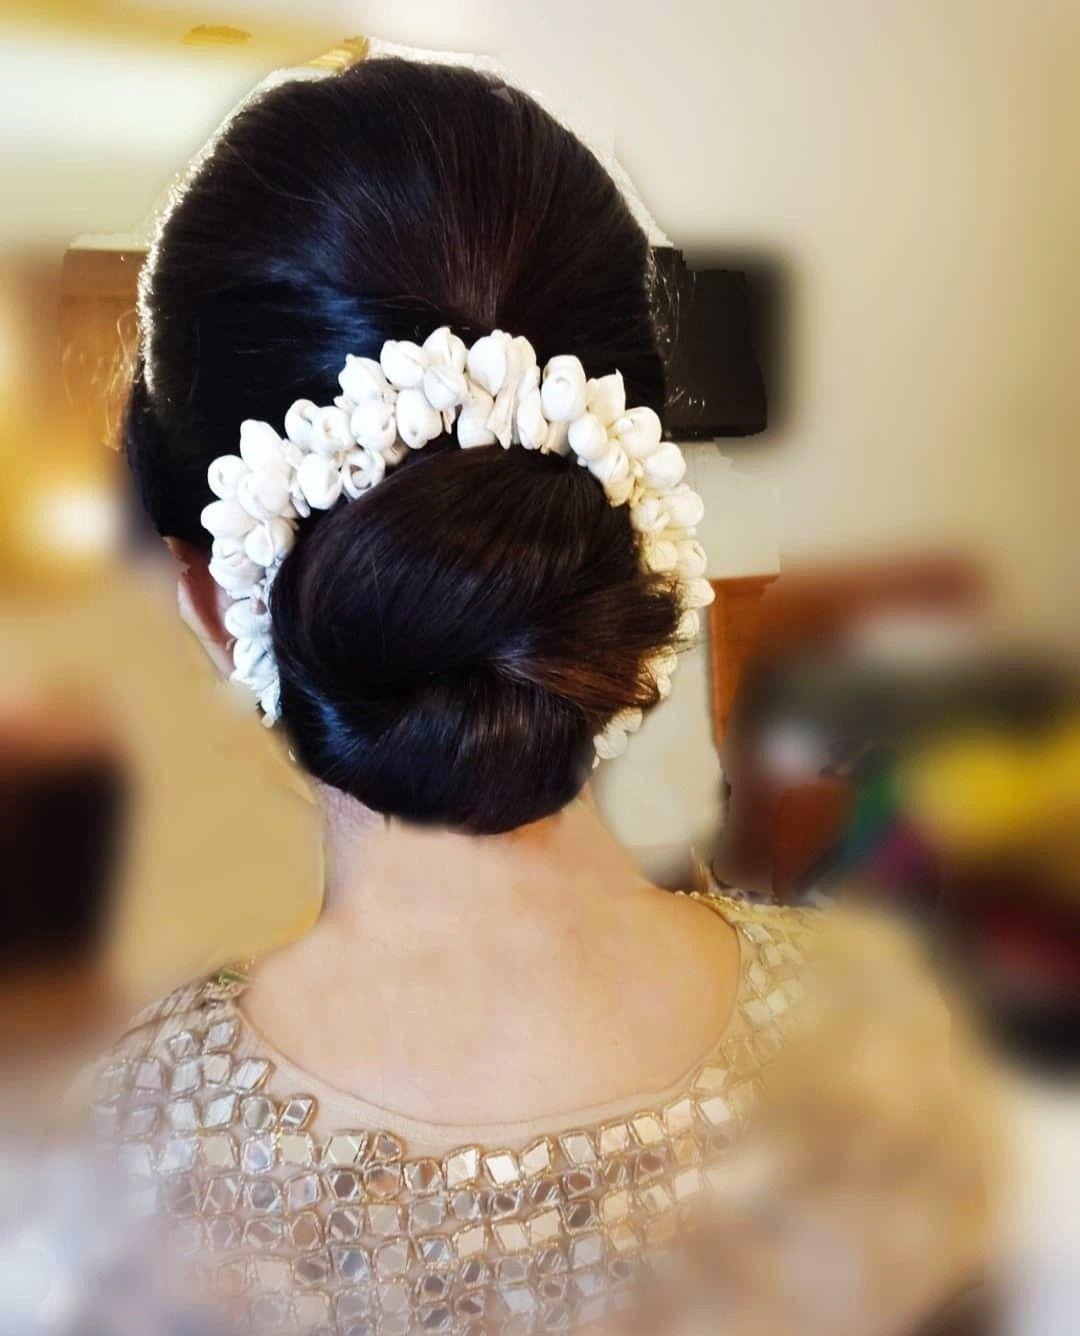 20 Breezy Low Bun Hairstyles With Gajra Bridal Hair Buns Hairdo Wedding Low Bun Hairstyles